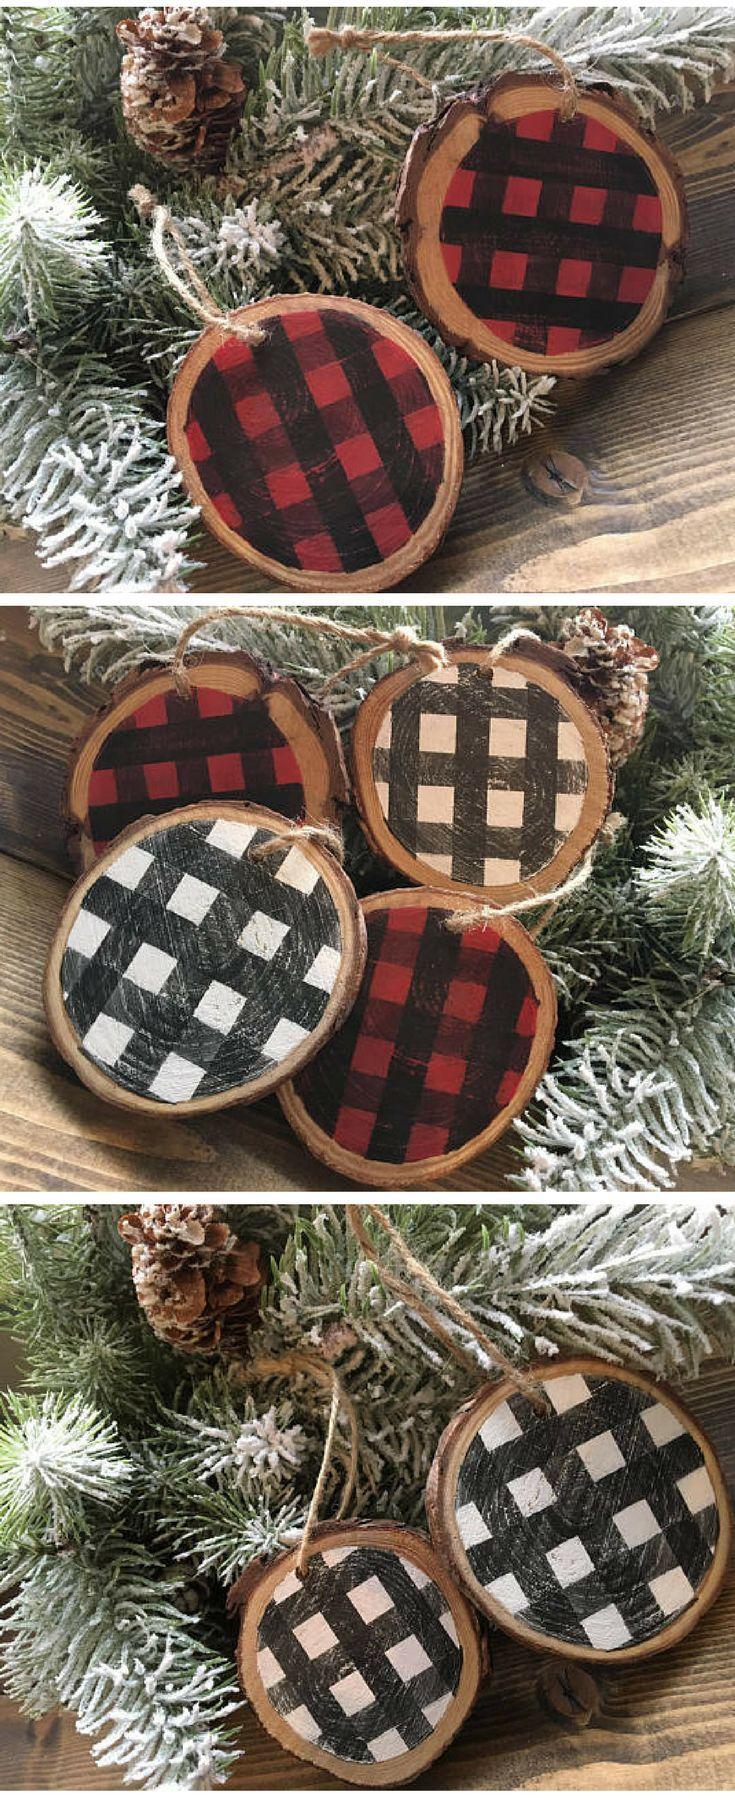 Set Of 8 Black And White Buffalo Check Plaid Farmhouse Christmas Ornaments Luggage Tags